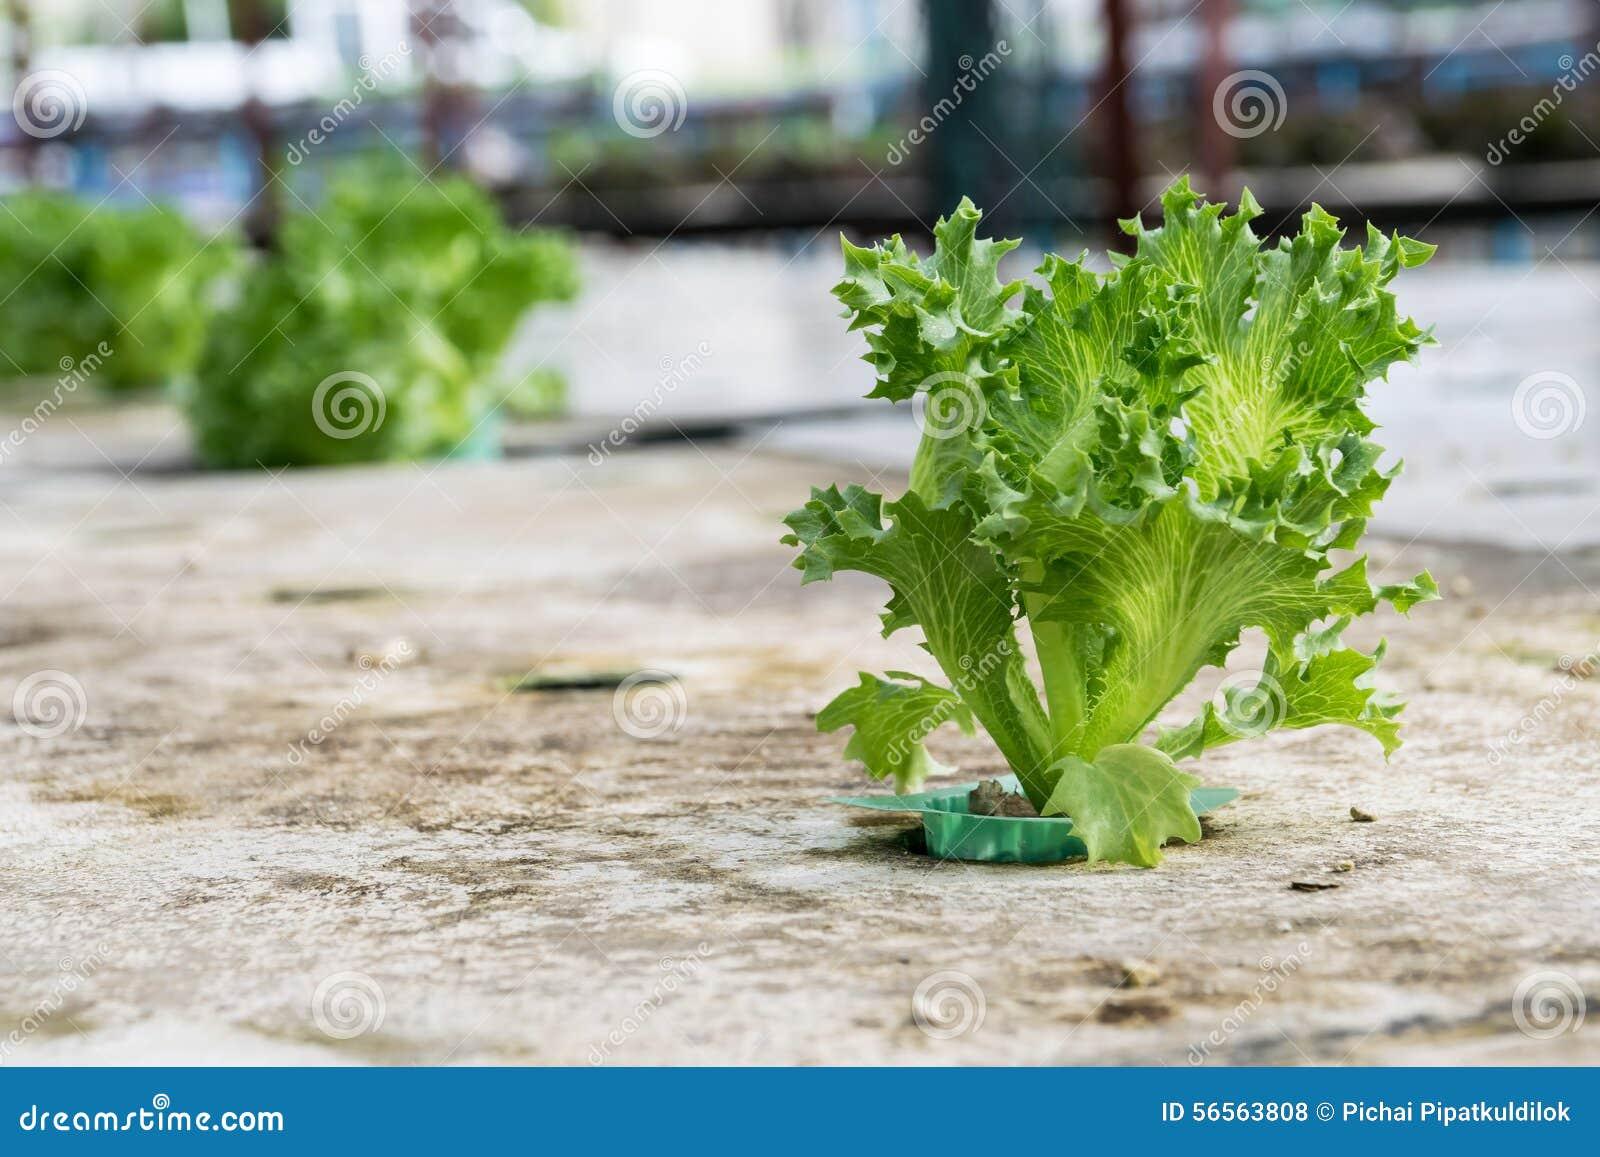 Download Hydroponics καλλιέργειας πράσινο λαχανικό στο αγρόκτημα Στοκ Εικόνες - εικόνα από σειρά, τρόφιμα: 56563808